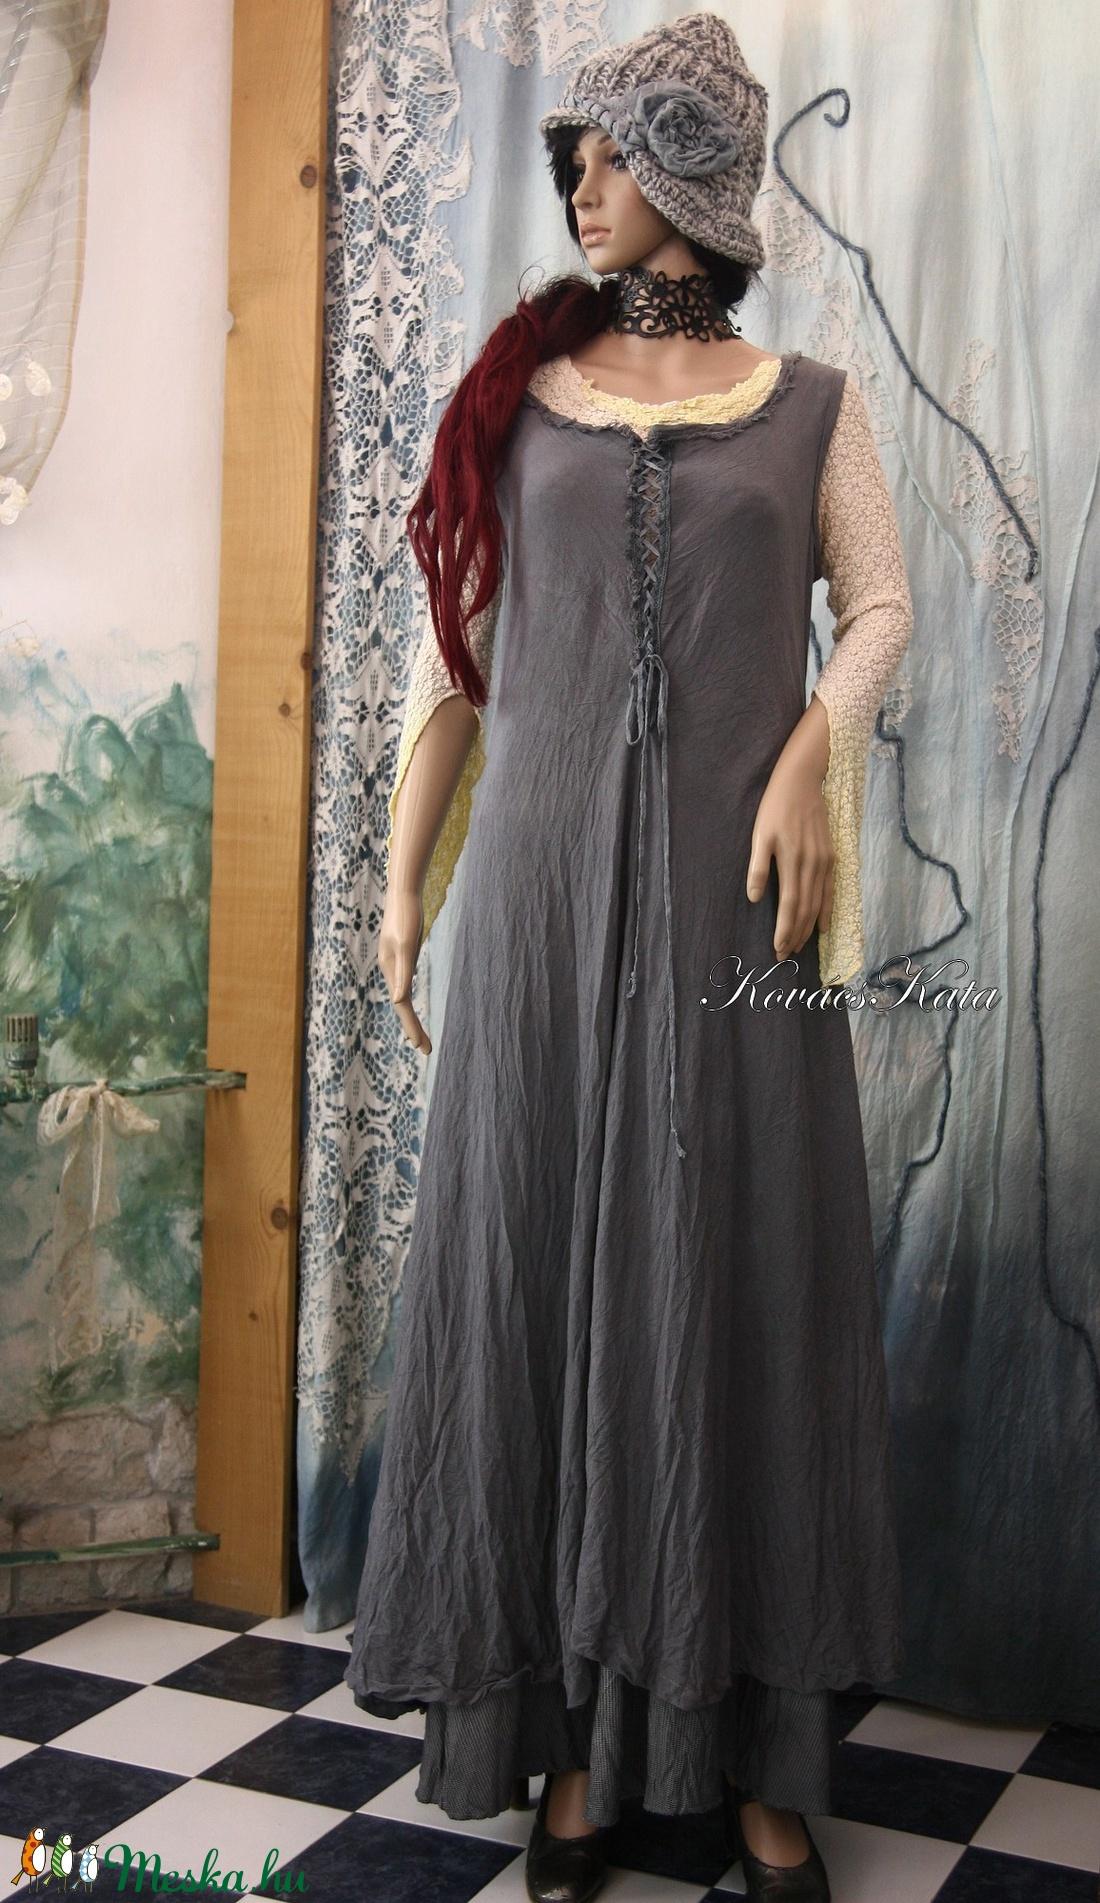 SZÜRKE  kirtle  - romantikus design-ruha - ruha & divat - női ruha - ruha - Meska.hu